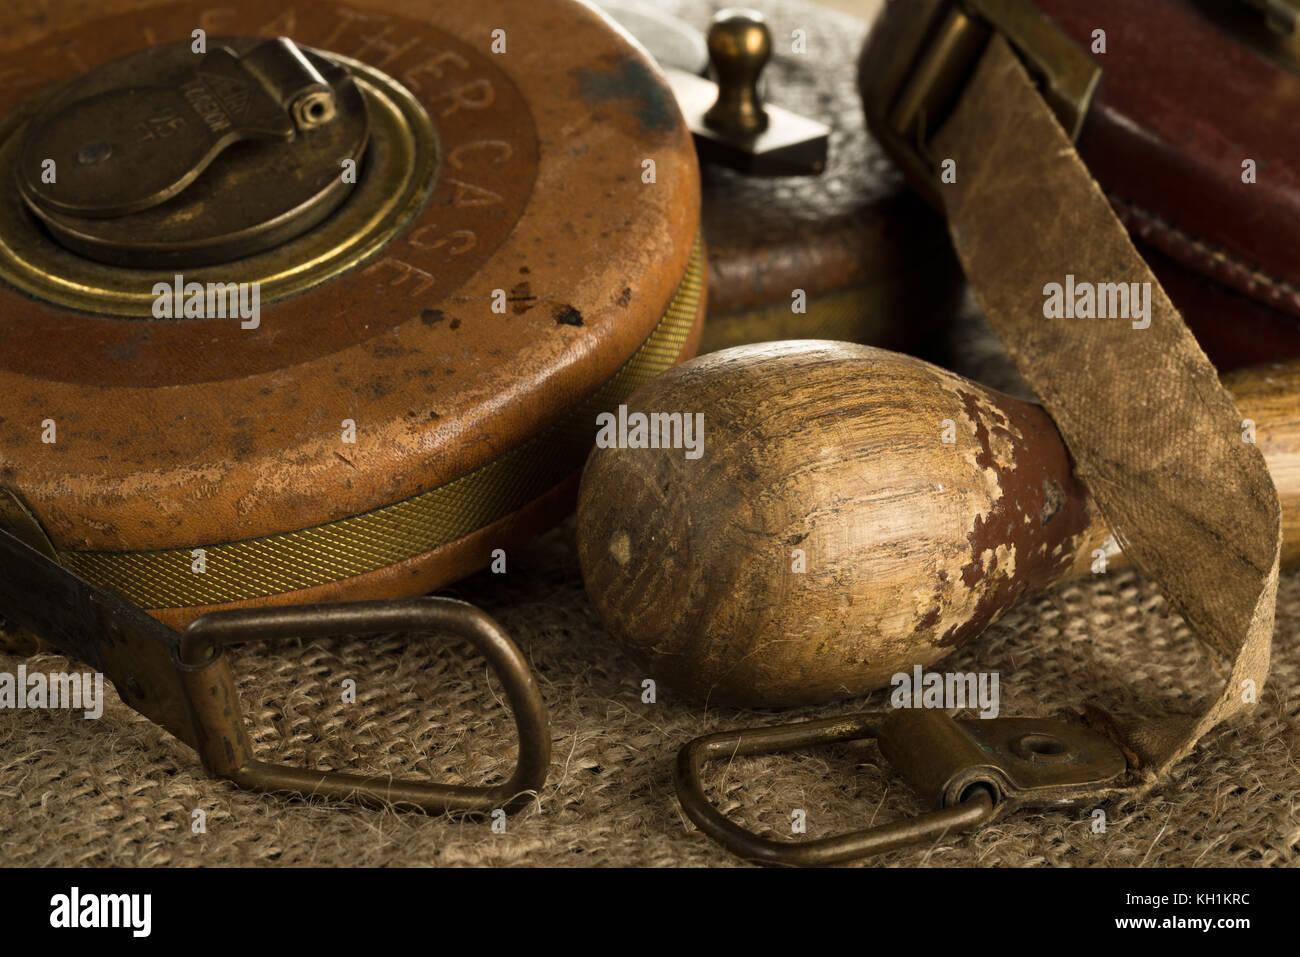 Einige alte Maßbänder still life Stockfoto